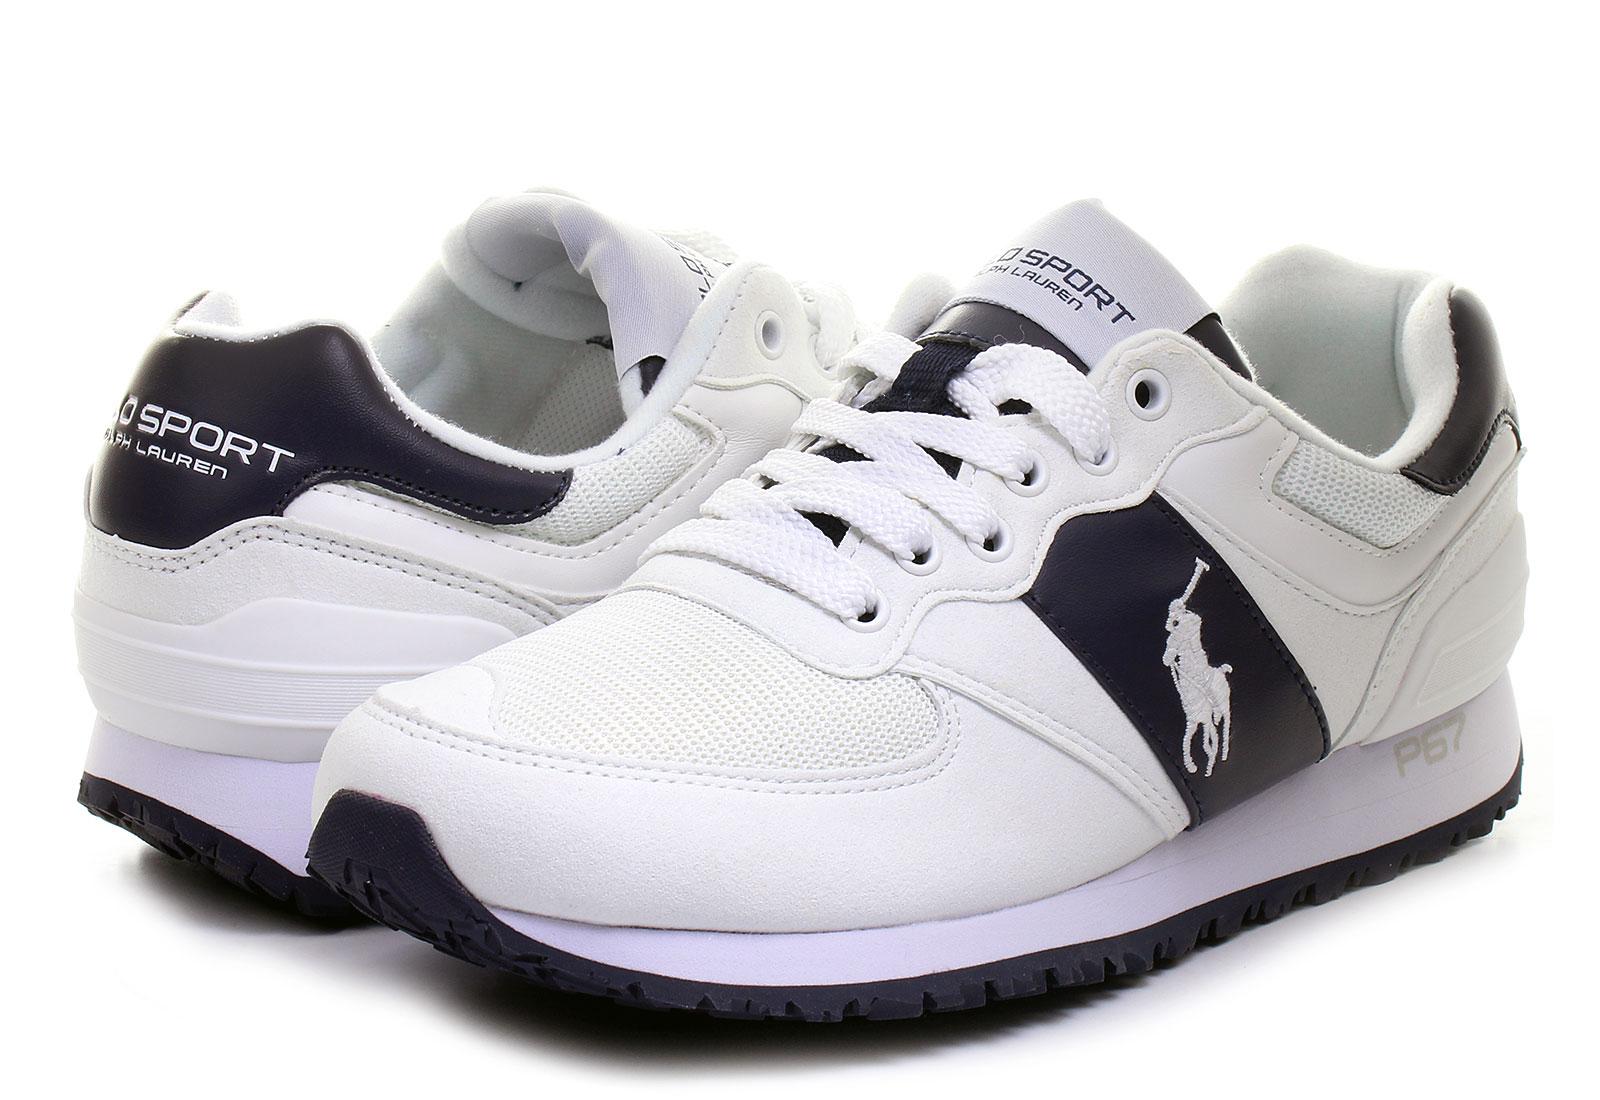 Polo Ralph Lauren Cipő - Slaton Pony - 2136-R-W140A - Office Shoes ... 8c1dcee0ed